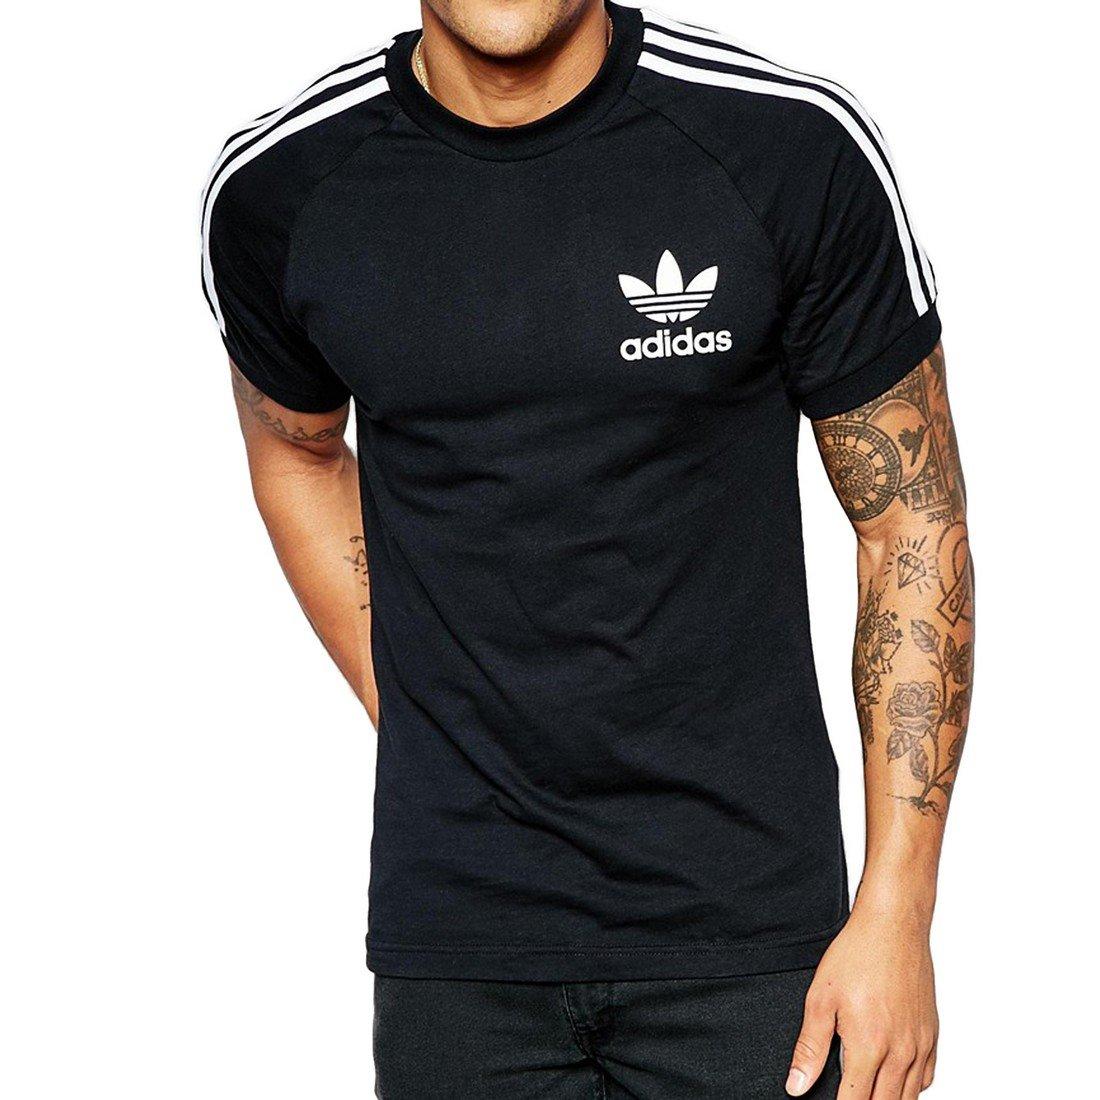 adidas Men's T Shirt California